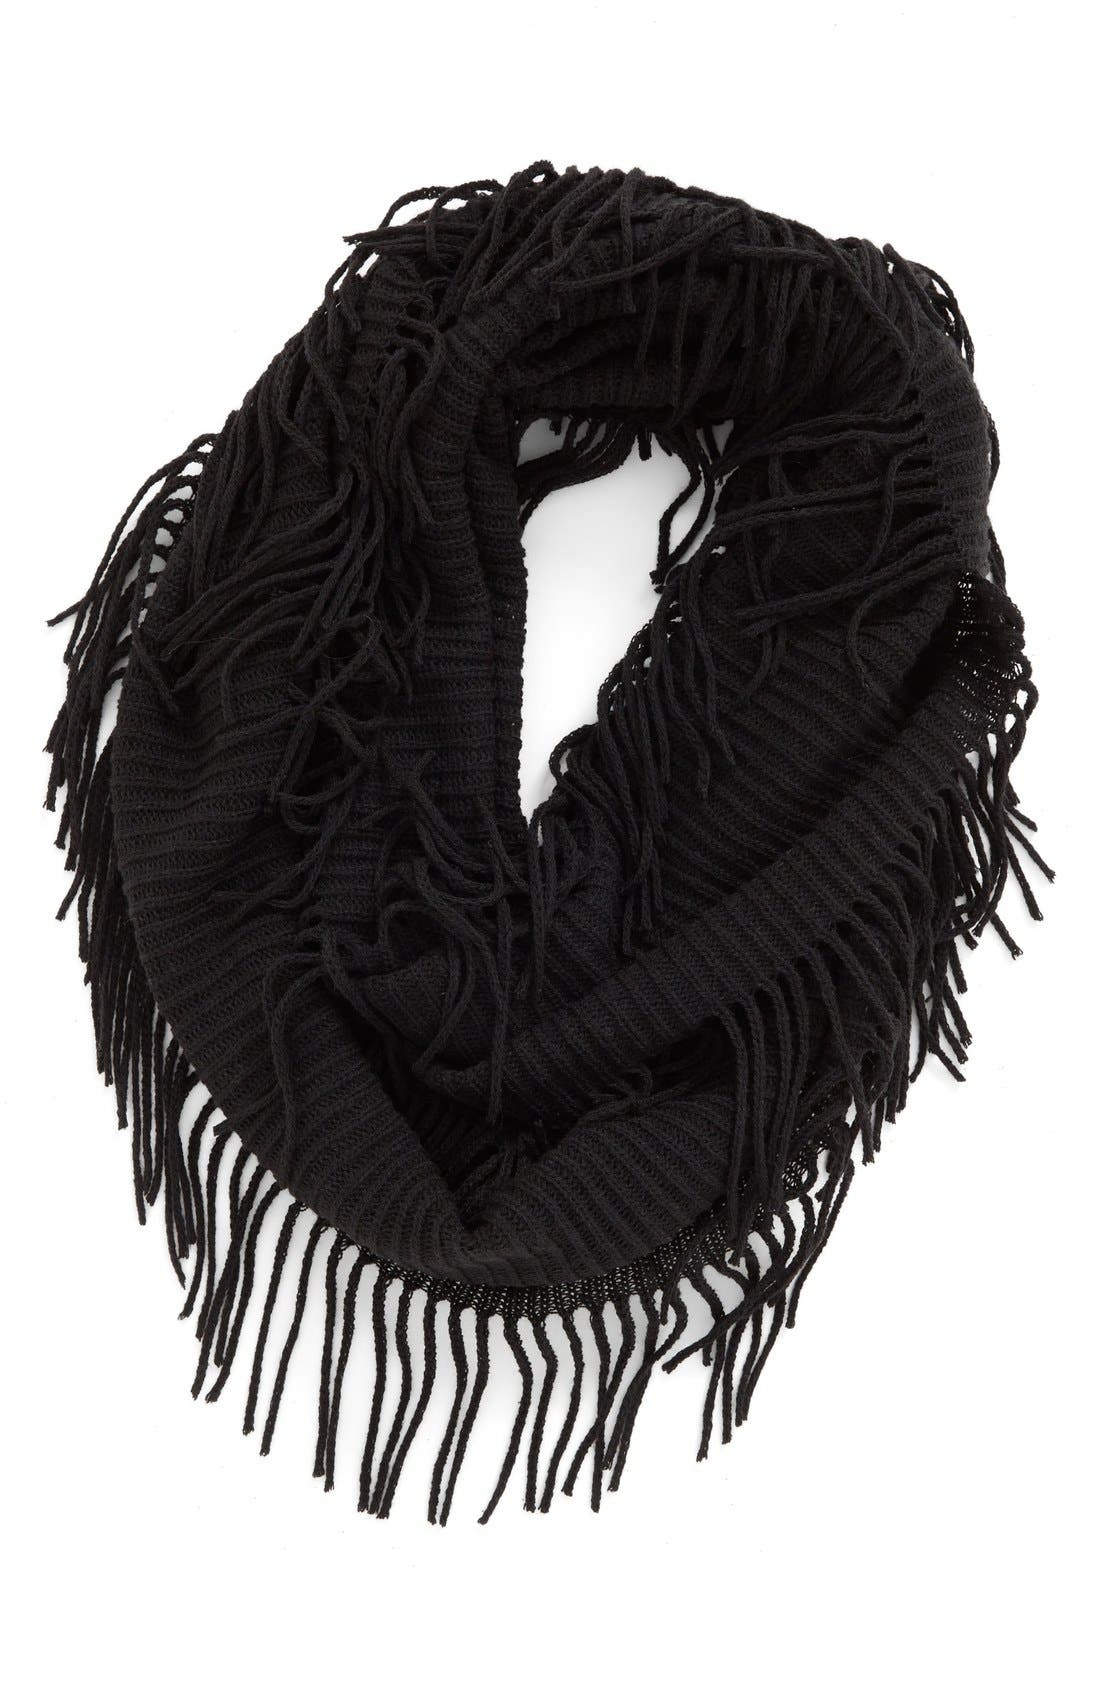 BP., Rib Knit Fringe Infinity Scarf, Main thumbnail 1, color, 001